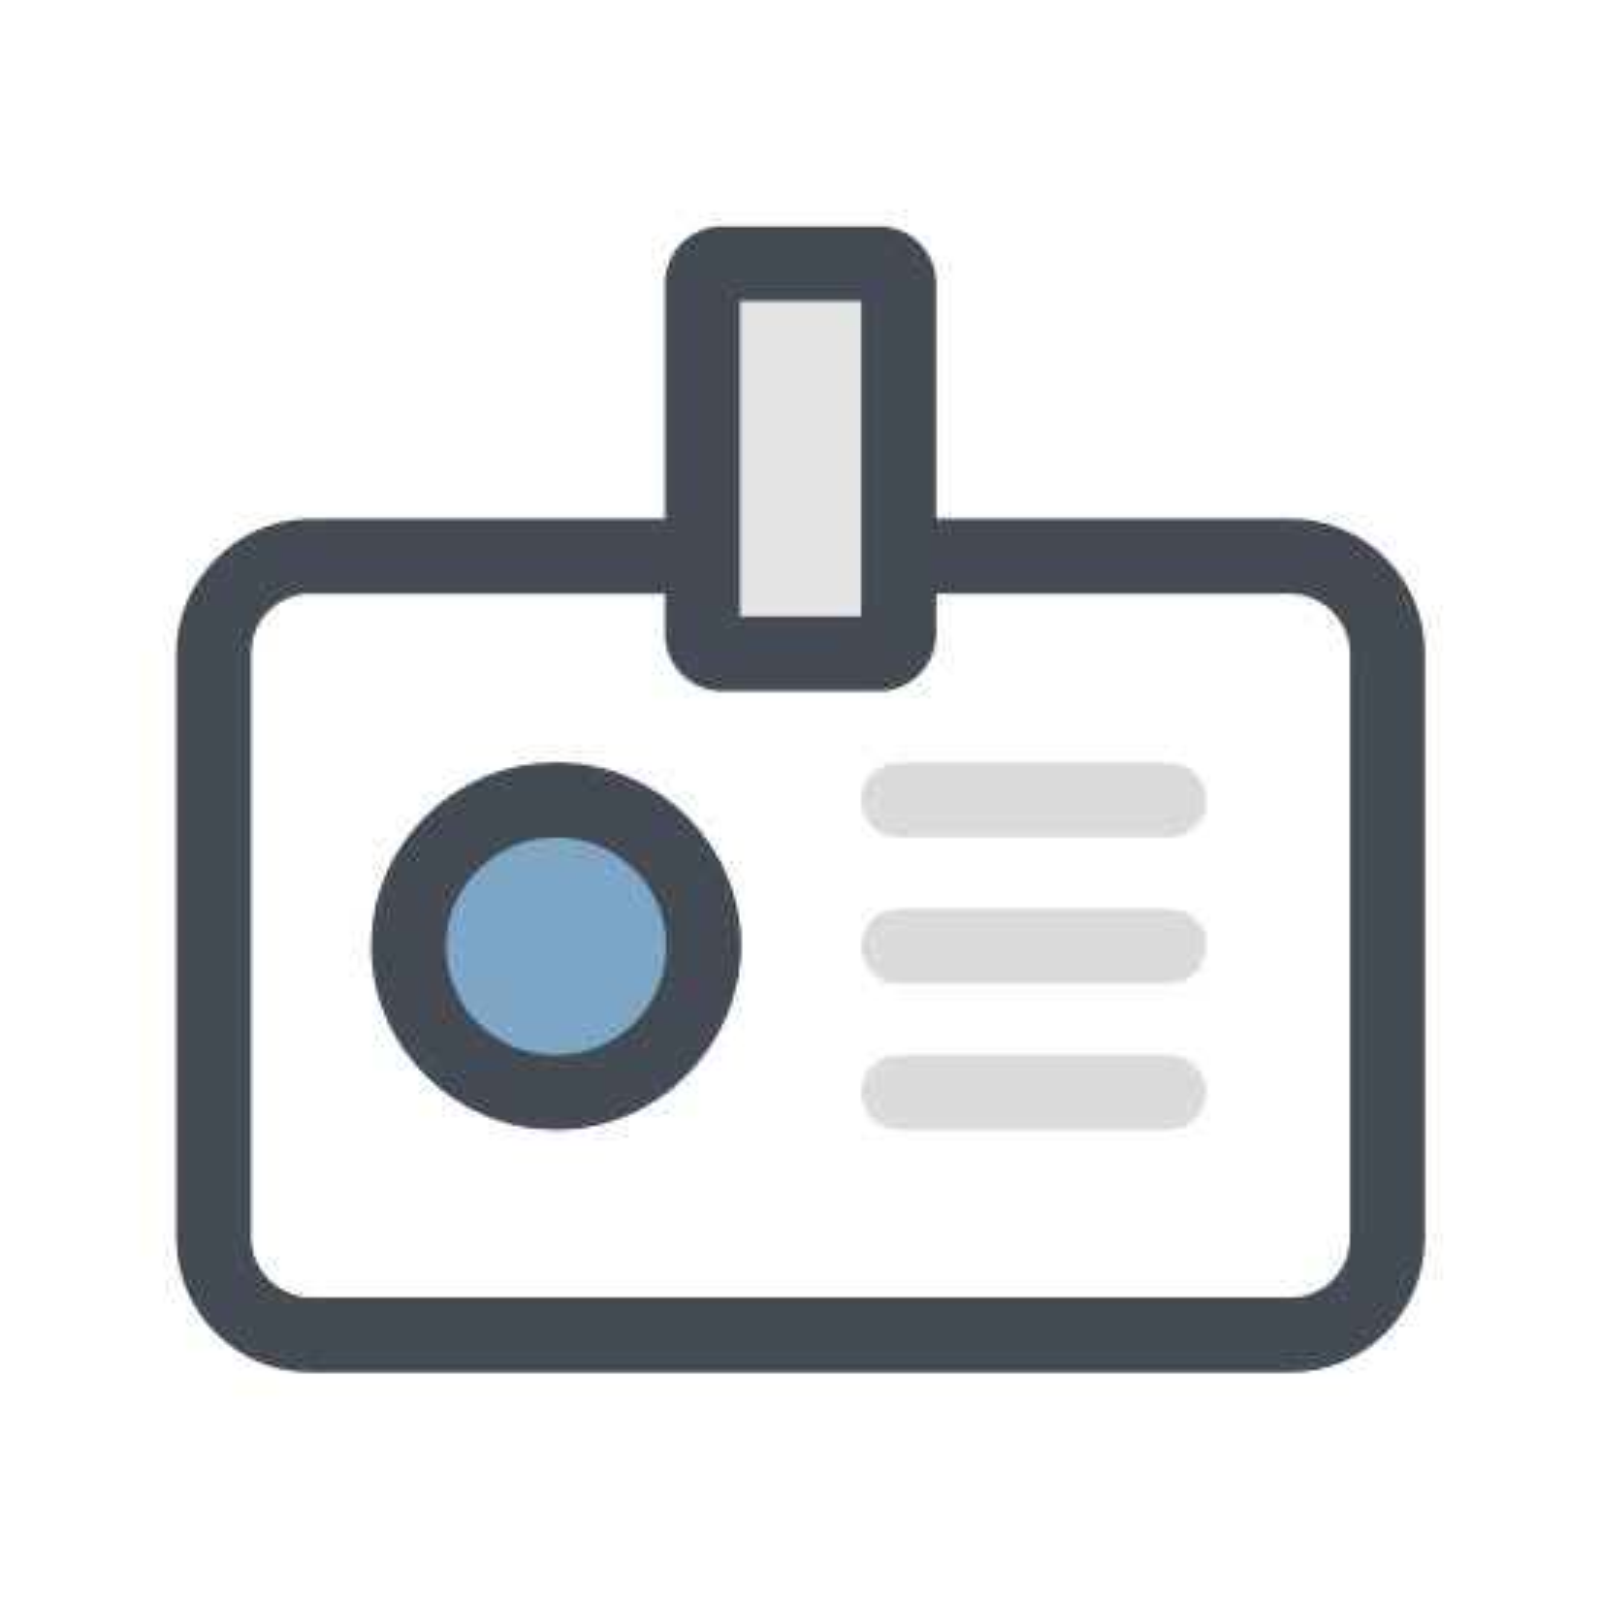 Identyfikator icon